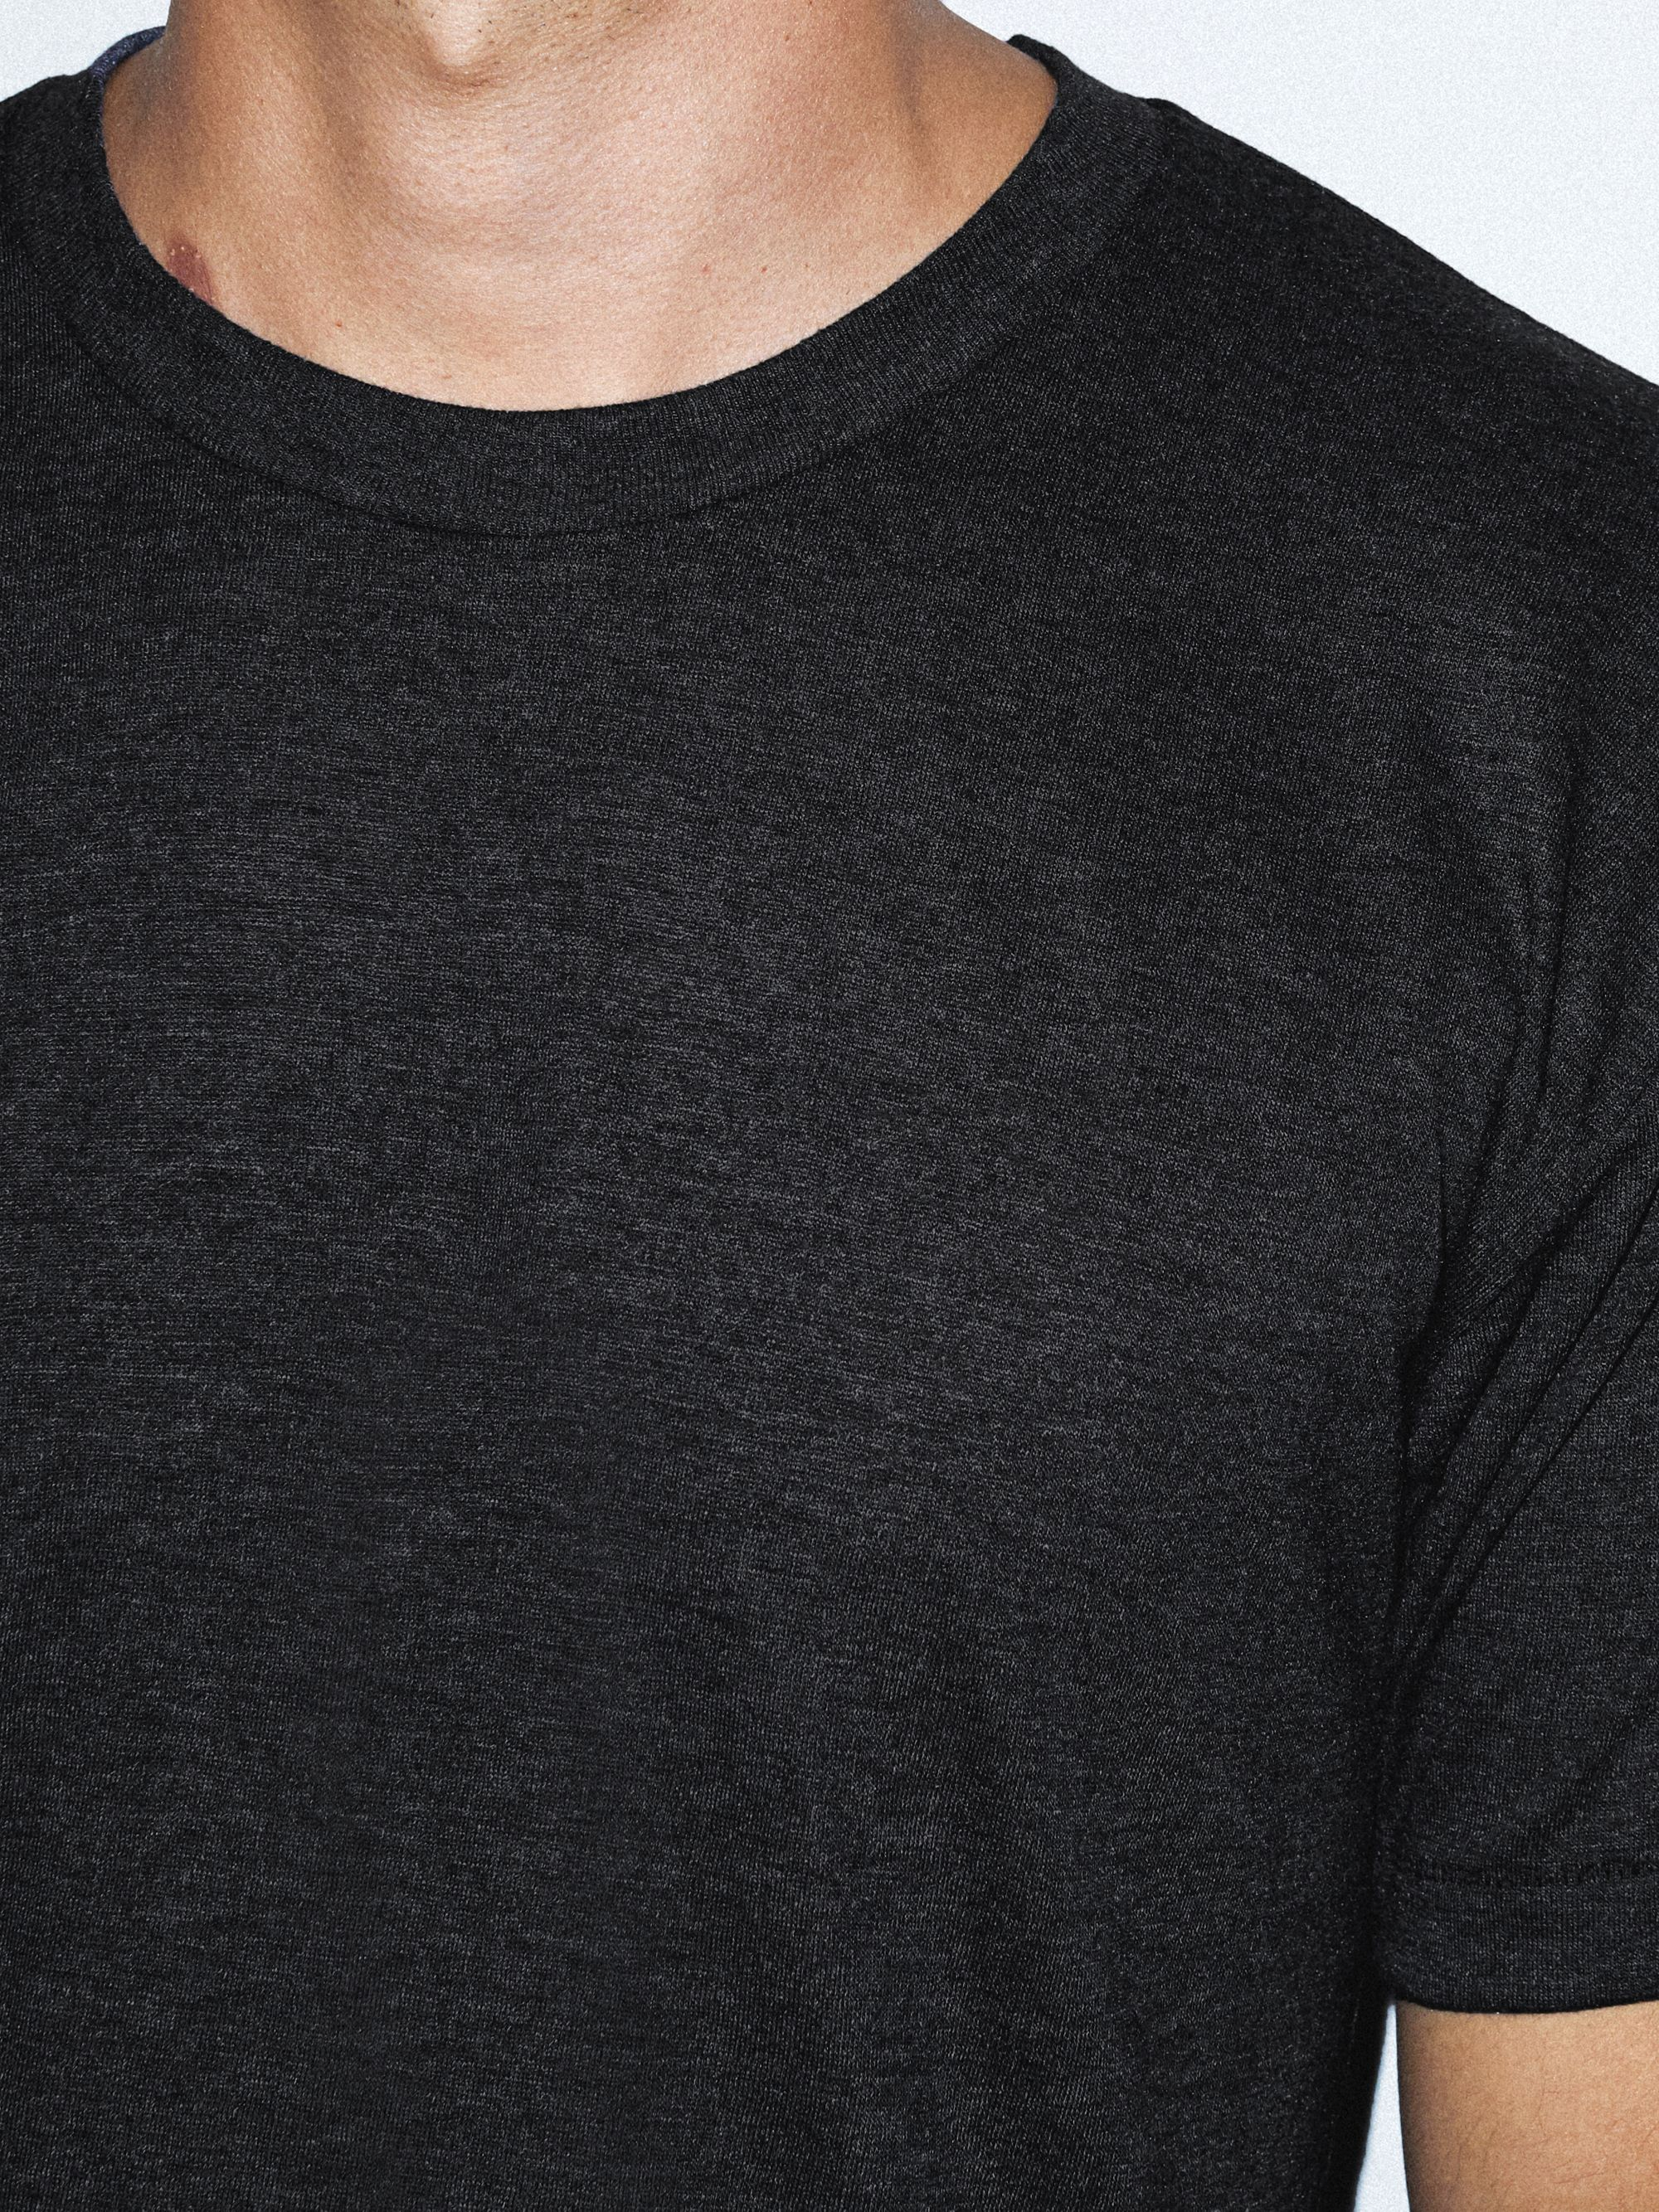 44d9ac6139 Tri-Blend Crewneck Track T-Shirt